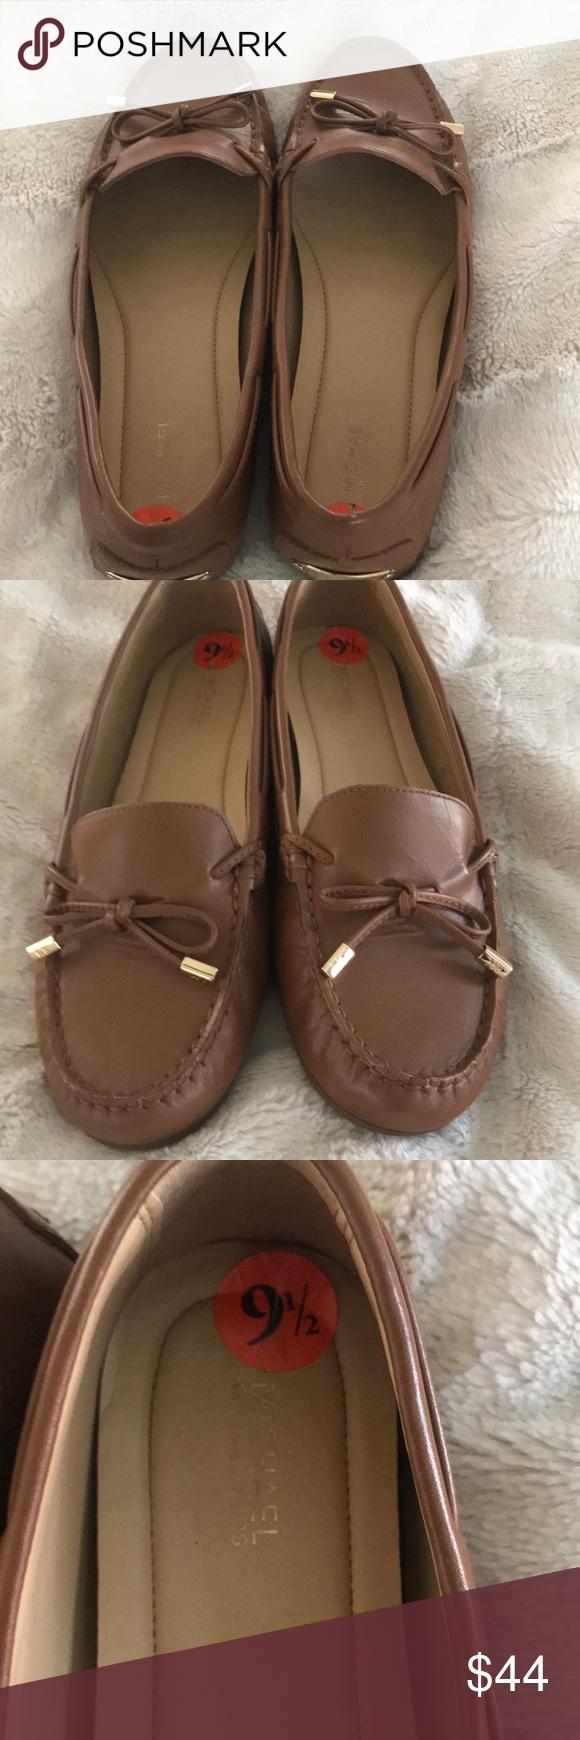 Michael Kors Flat Loafers | Michael